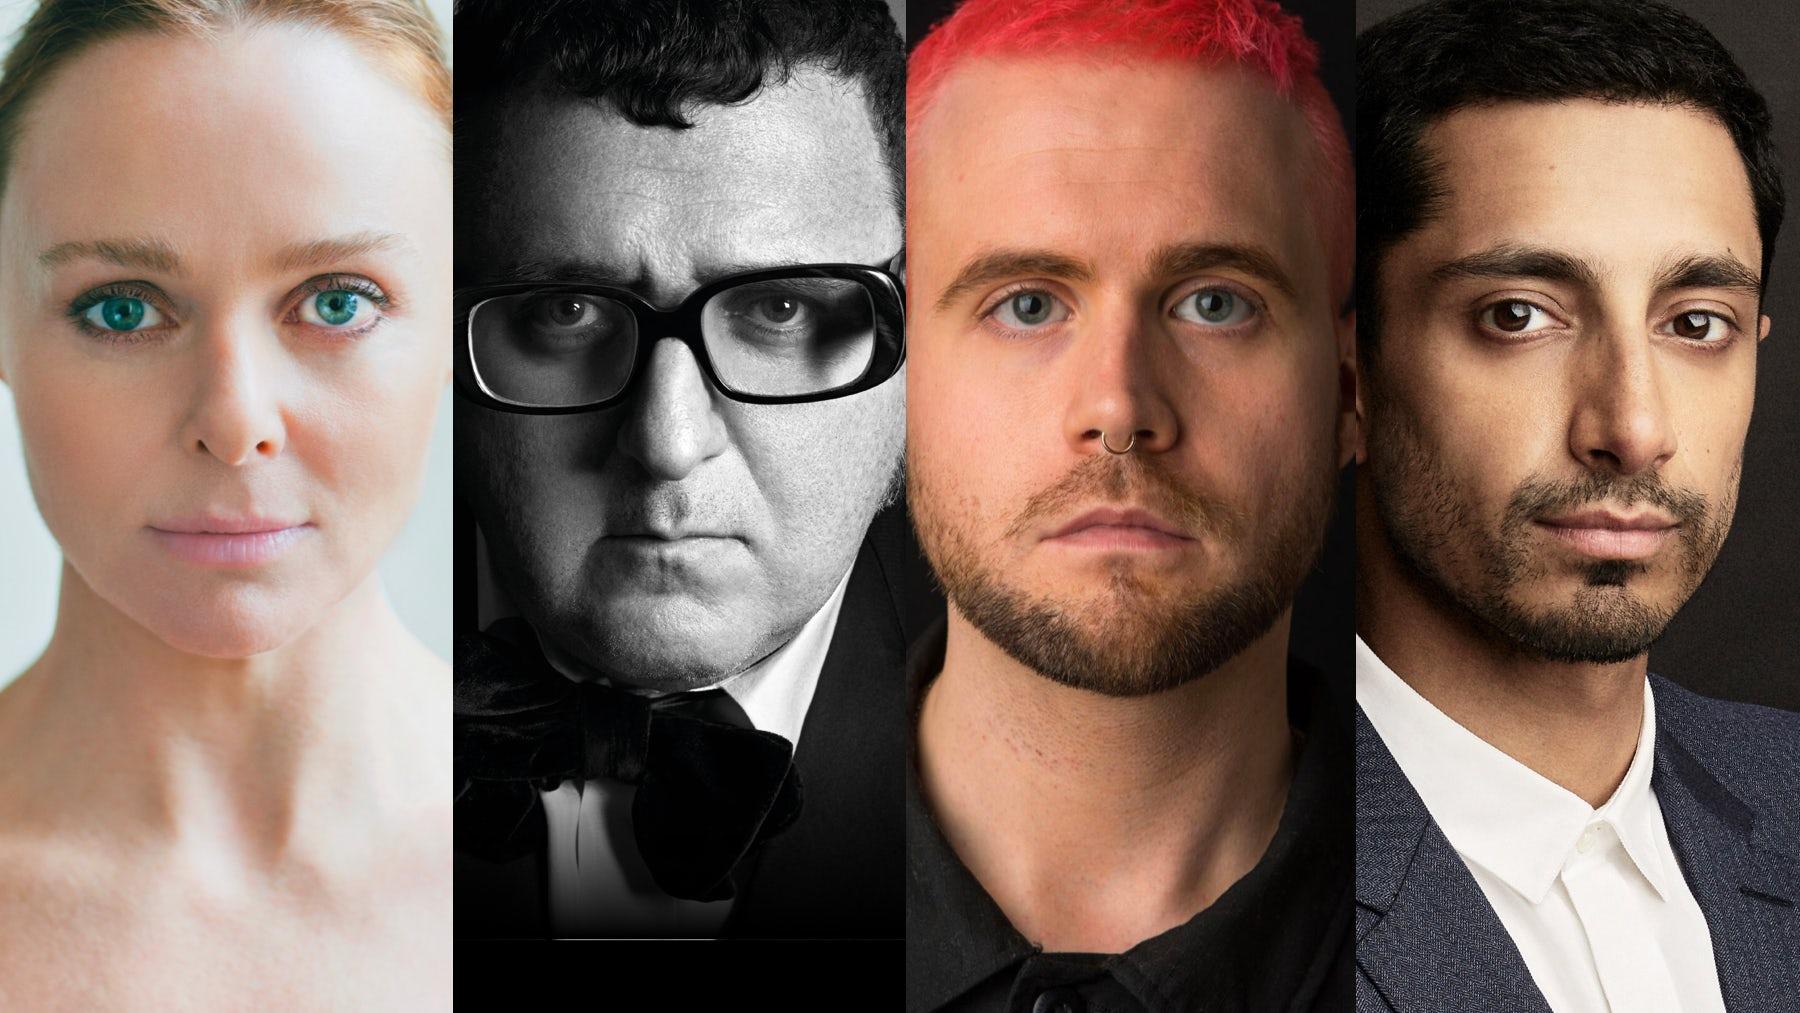 L-R: Stella McCartney, Alber Elbaz, Christopher Wylie and Riz Ahmed | Sources: Courtesy